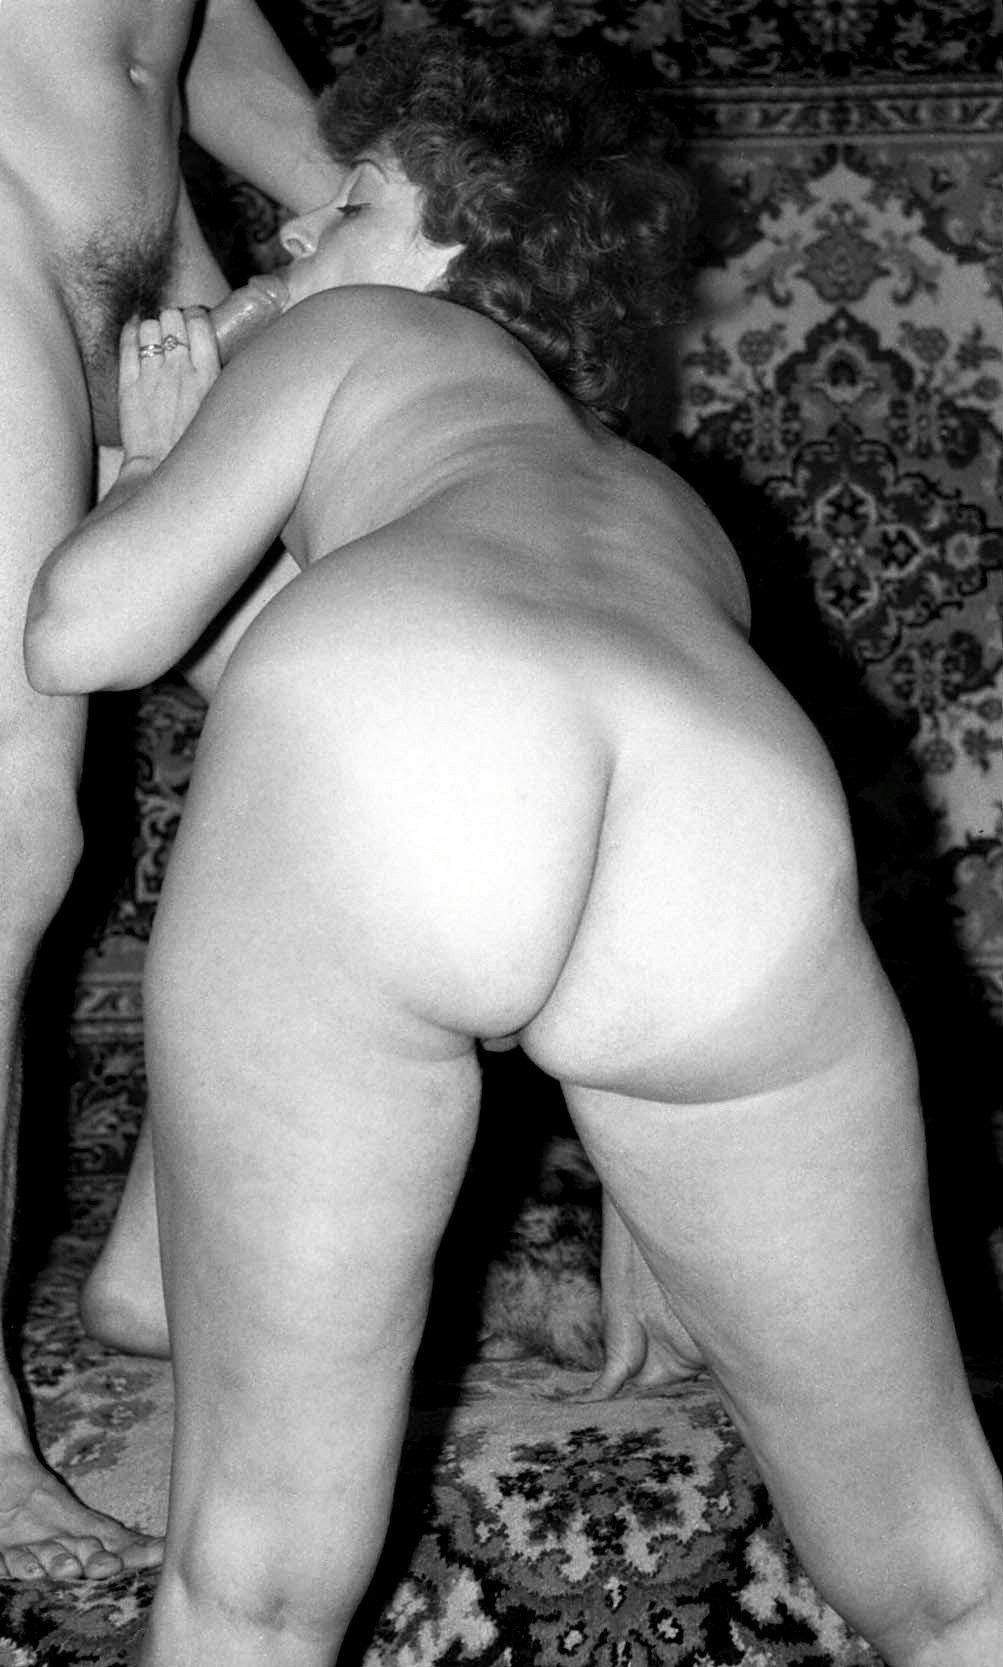 sovetskoe-porno-smotret-video-porno-s-gimnastkami-krupnim-planom